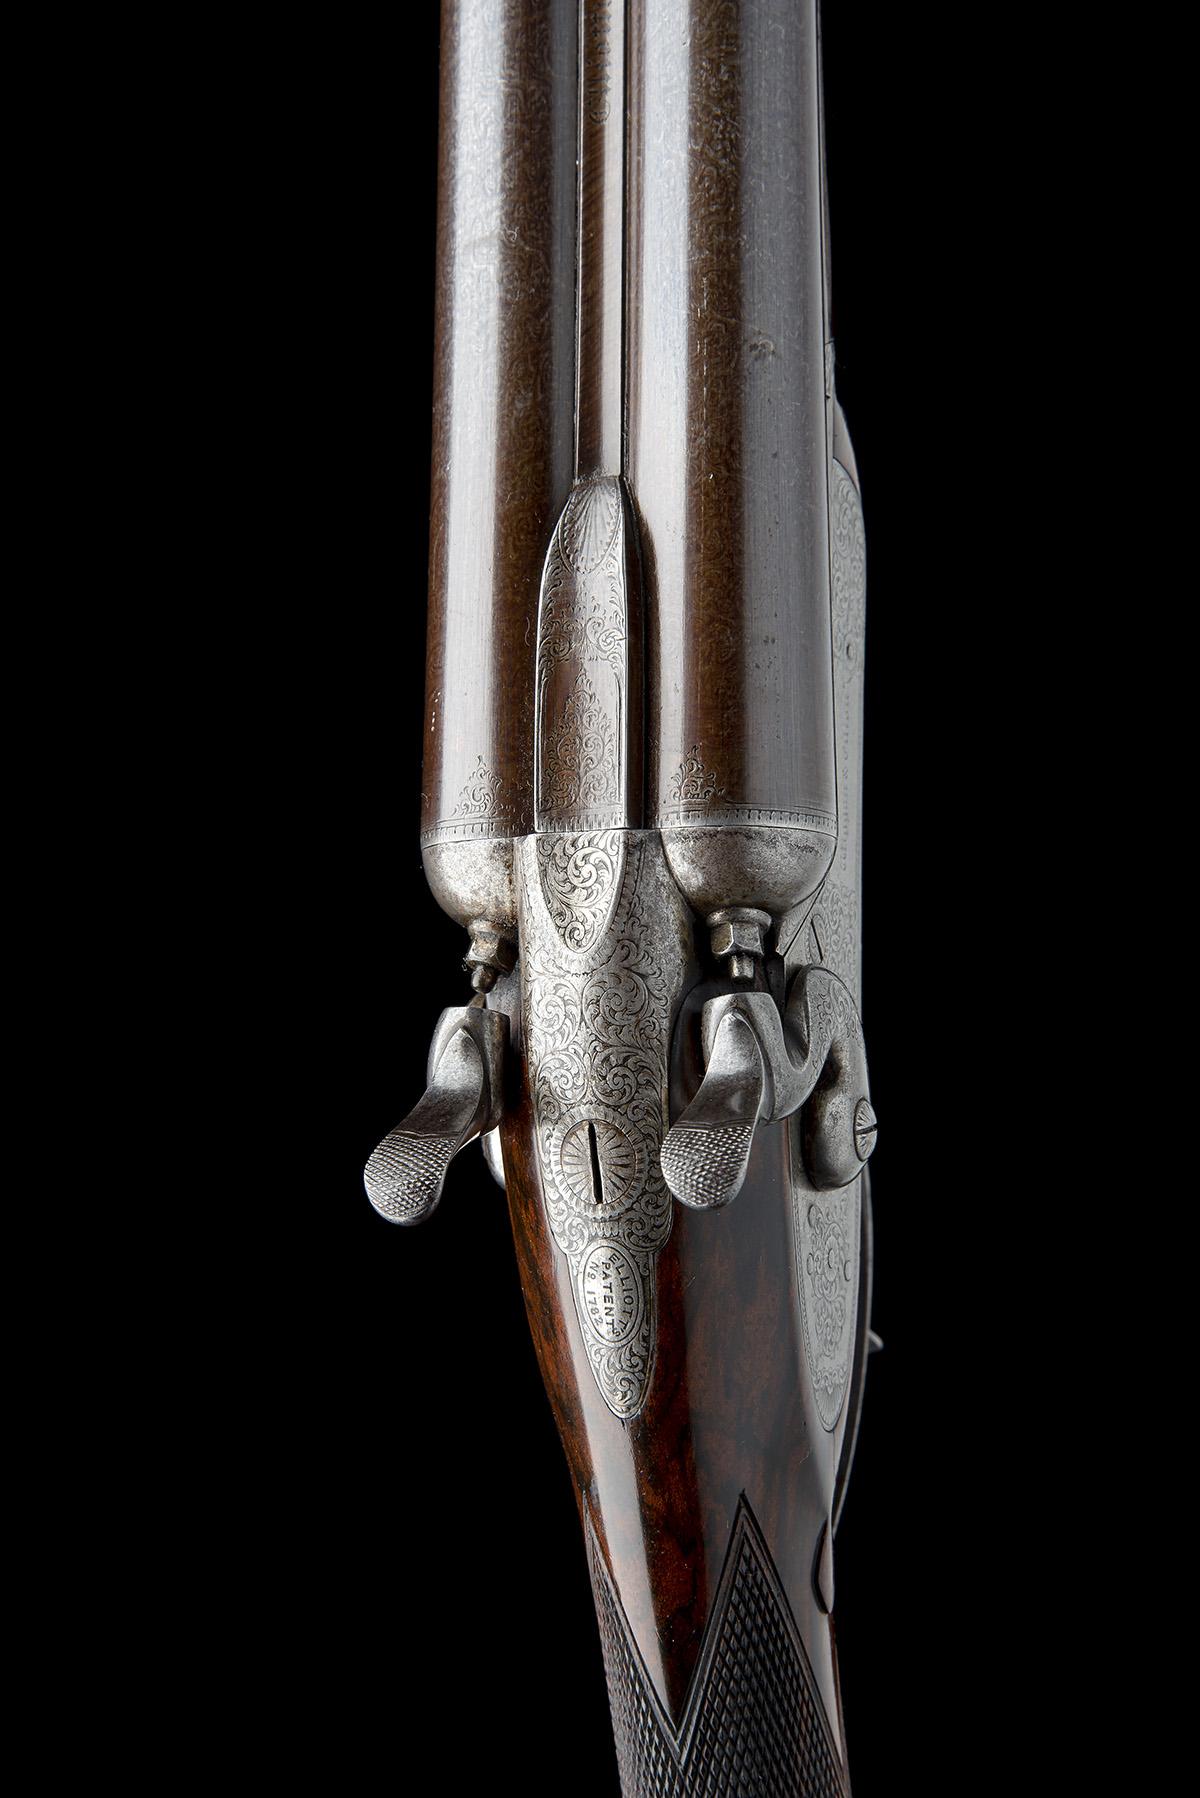 WIGGAN & ELLIOTT A SCARCE 12-BORE HENRY ELLIOTT 1863 PATENT PUSH-FORWARD UNDERLEVER ROTATING - Image 4 of 8